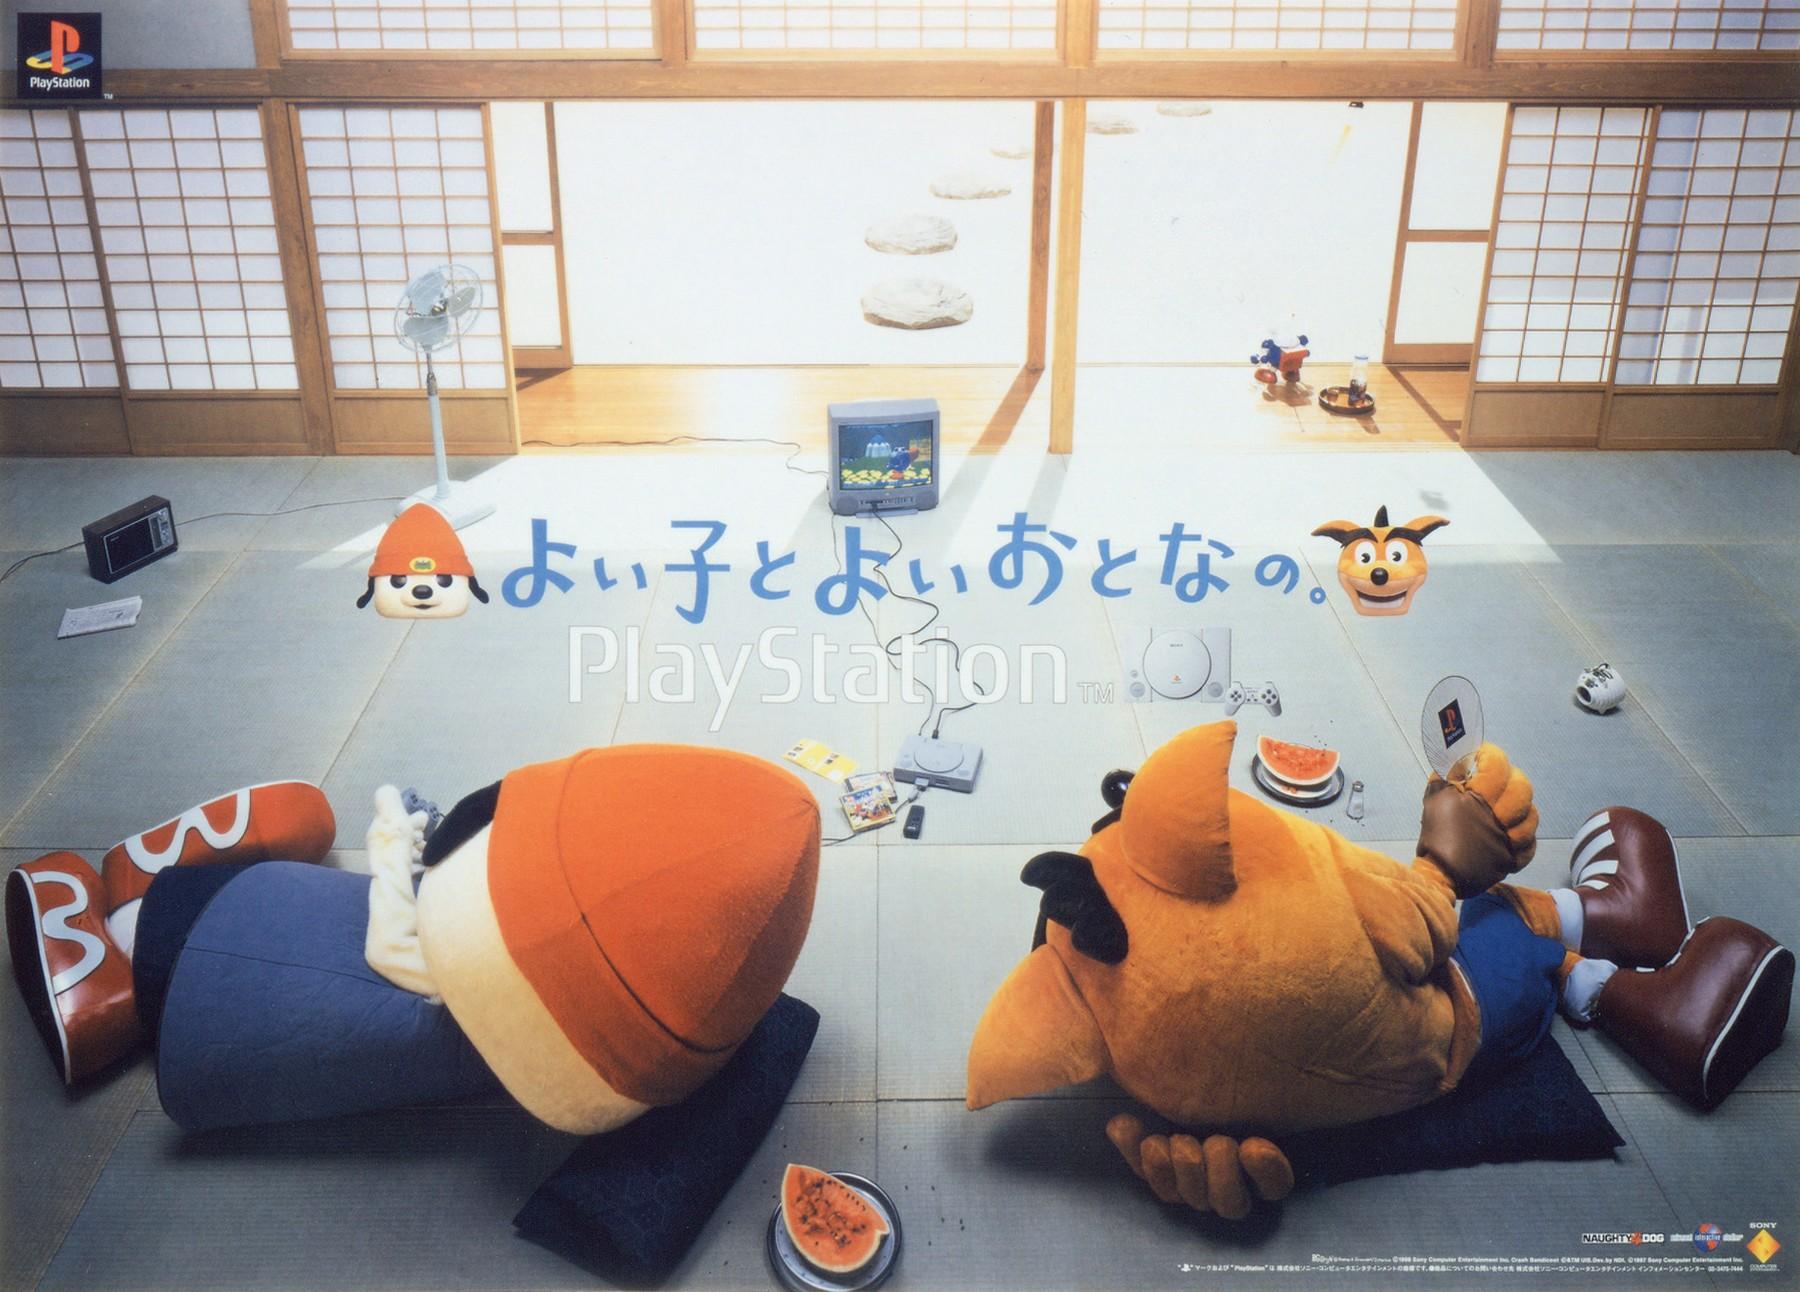 Japanese Parappa the Rapper and Crash Bandicoot ad